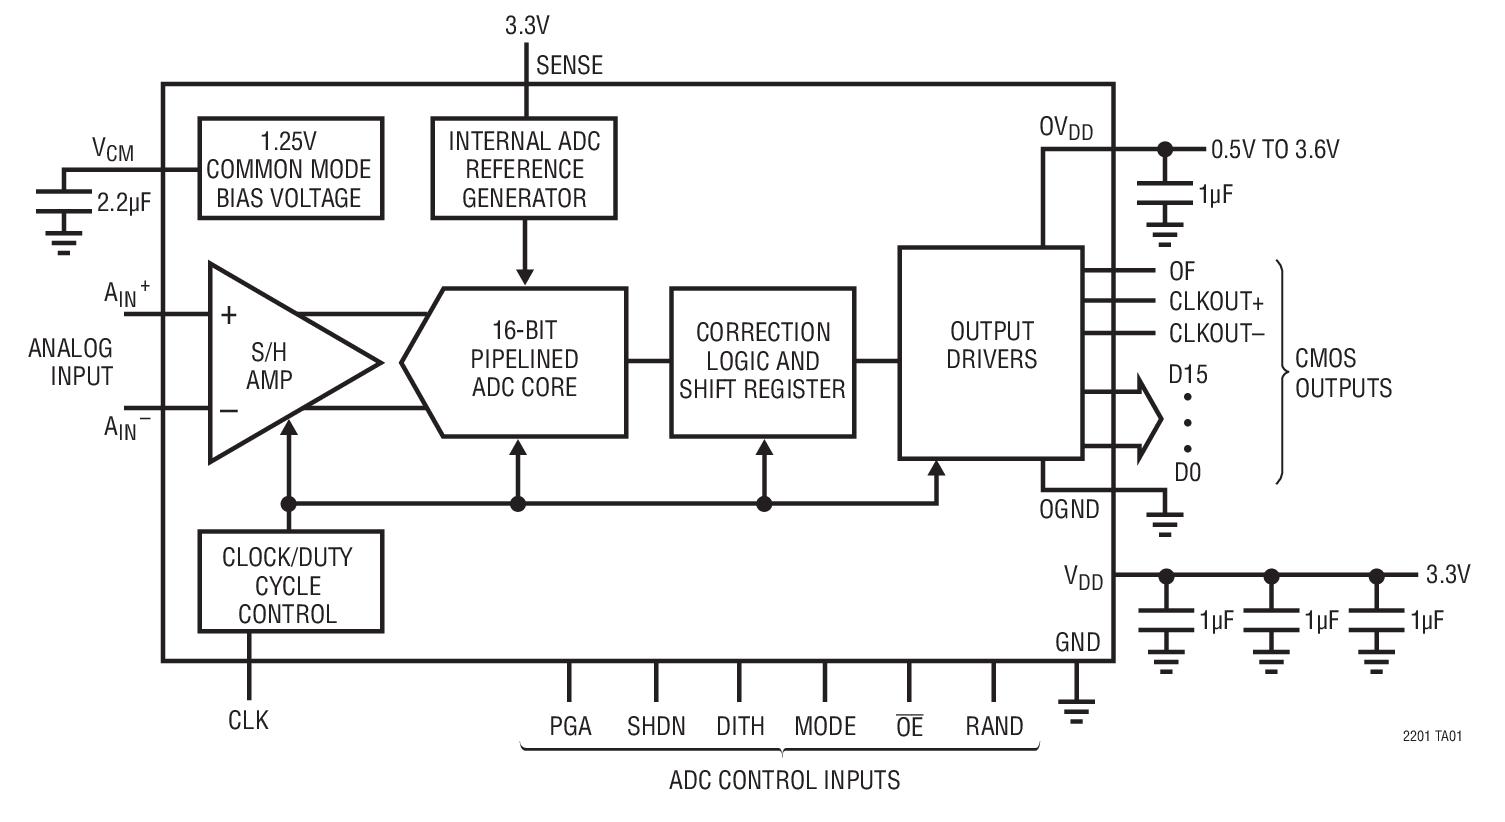 LTC2201 是一款20Msps、采样 16 位 A/D 转换器,专为对具有高达 380MHz 输入频率的高频、宽动态范围信号进行数字化处理而设计。可以利用 PGA 前端对该 ADC 的输入范围实施优化。 LTC2201 非常适合于要求苛刻的应用,其 AC 性能包括 81.6dB SNR 和 100dB 无杂散动态范围 (SFDR)。最大 DC 规格包括 5LSB INL、1LSB DNL (无漏失码)。 一个单独的输出电源允许 CMOS 输出摆幅在 0.